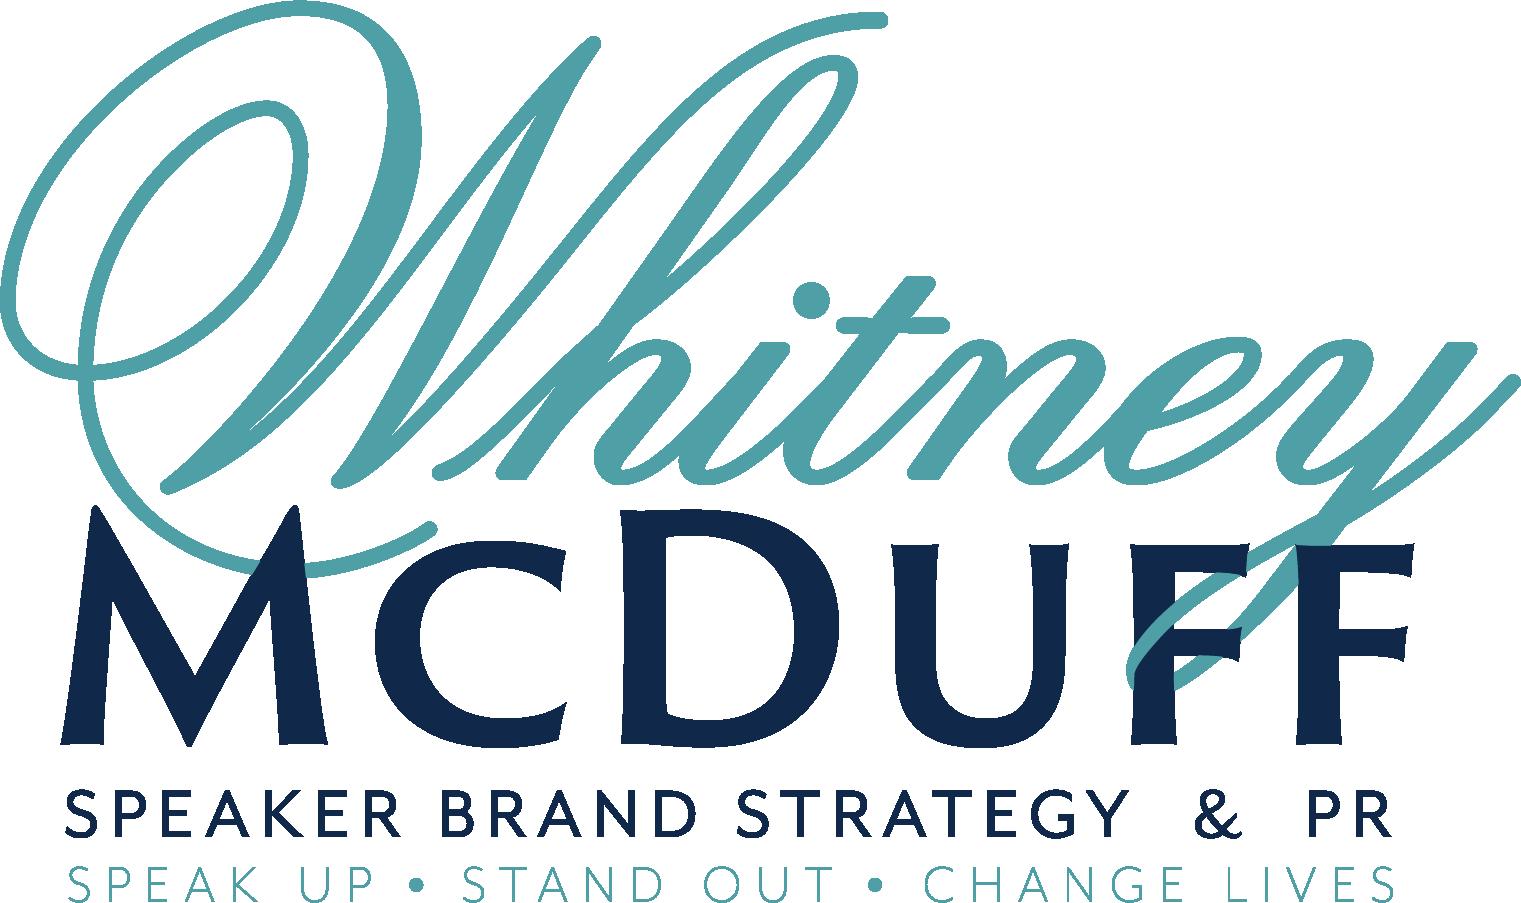 WhitneyMcDuff Logo